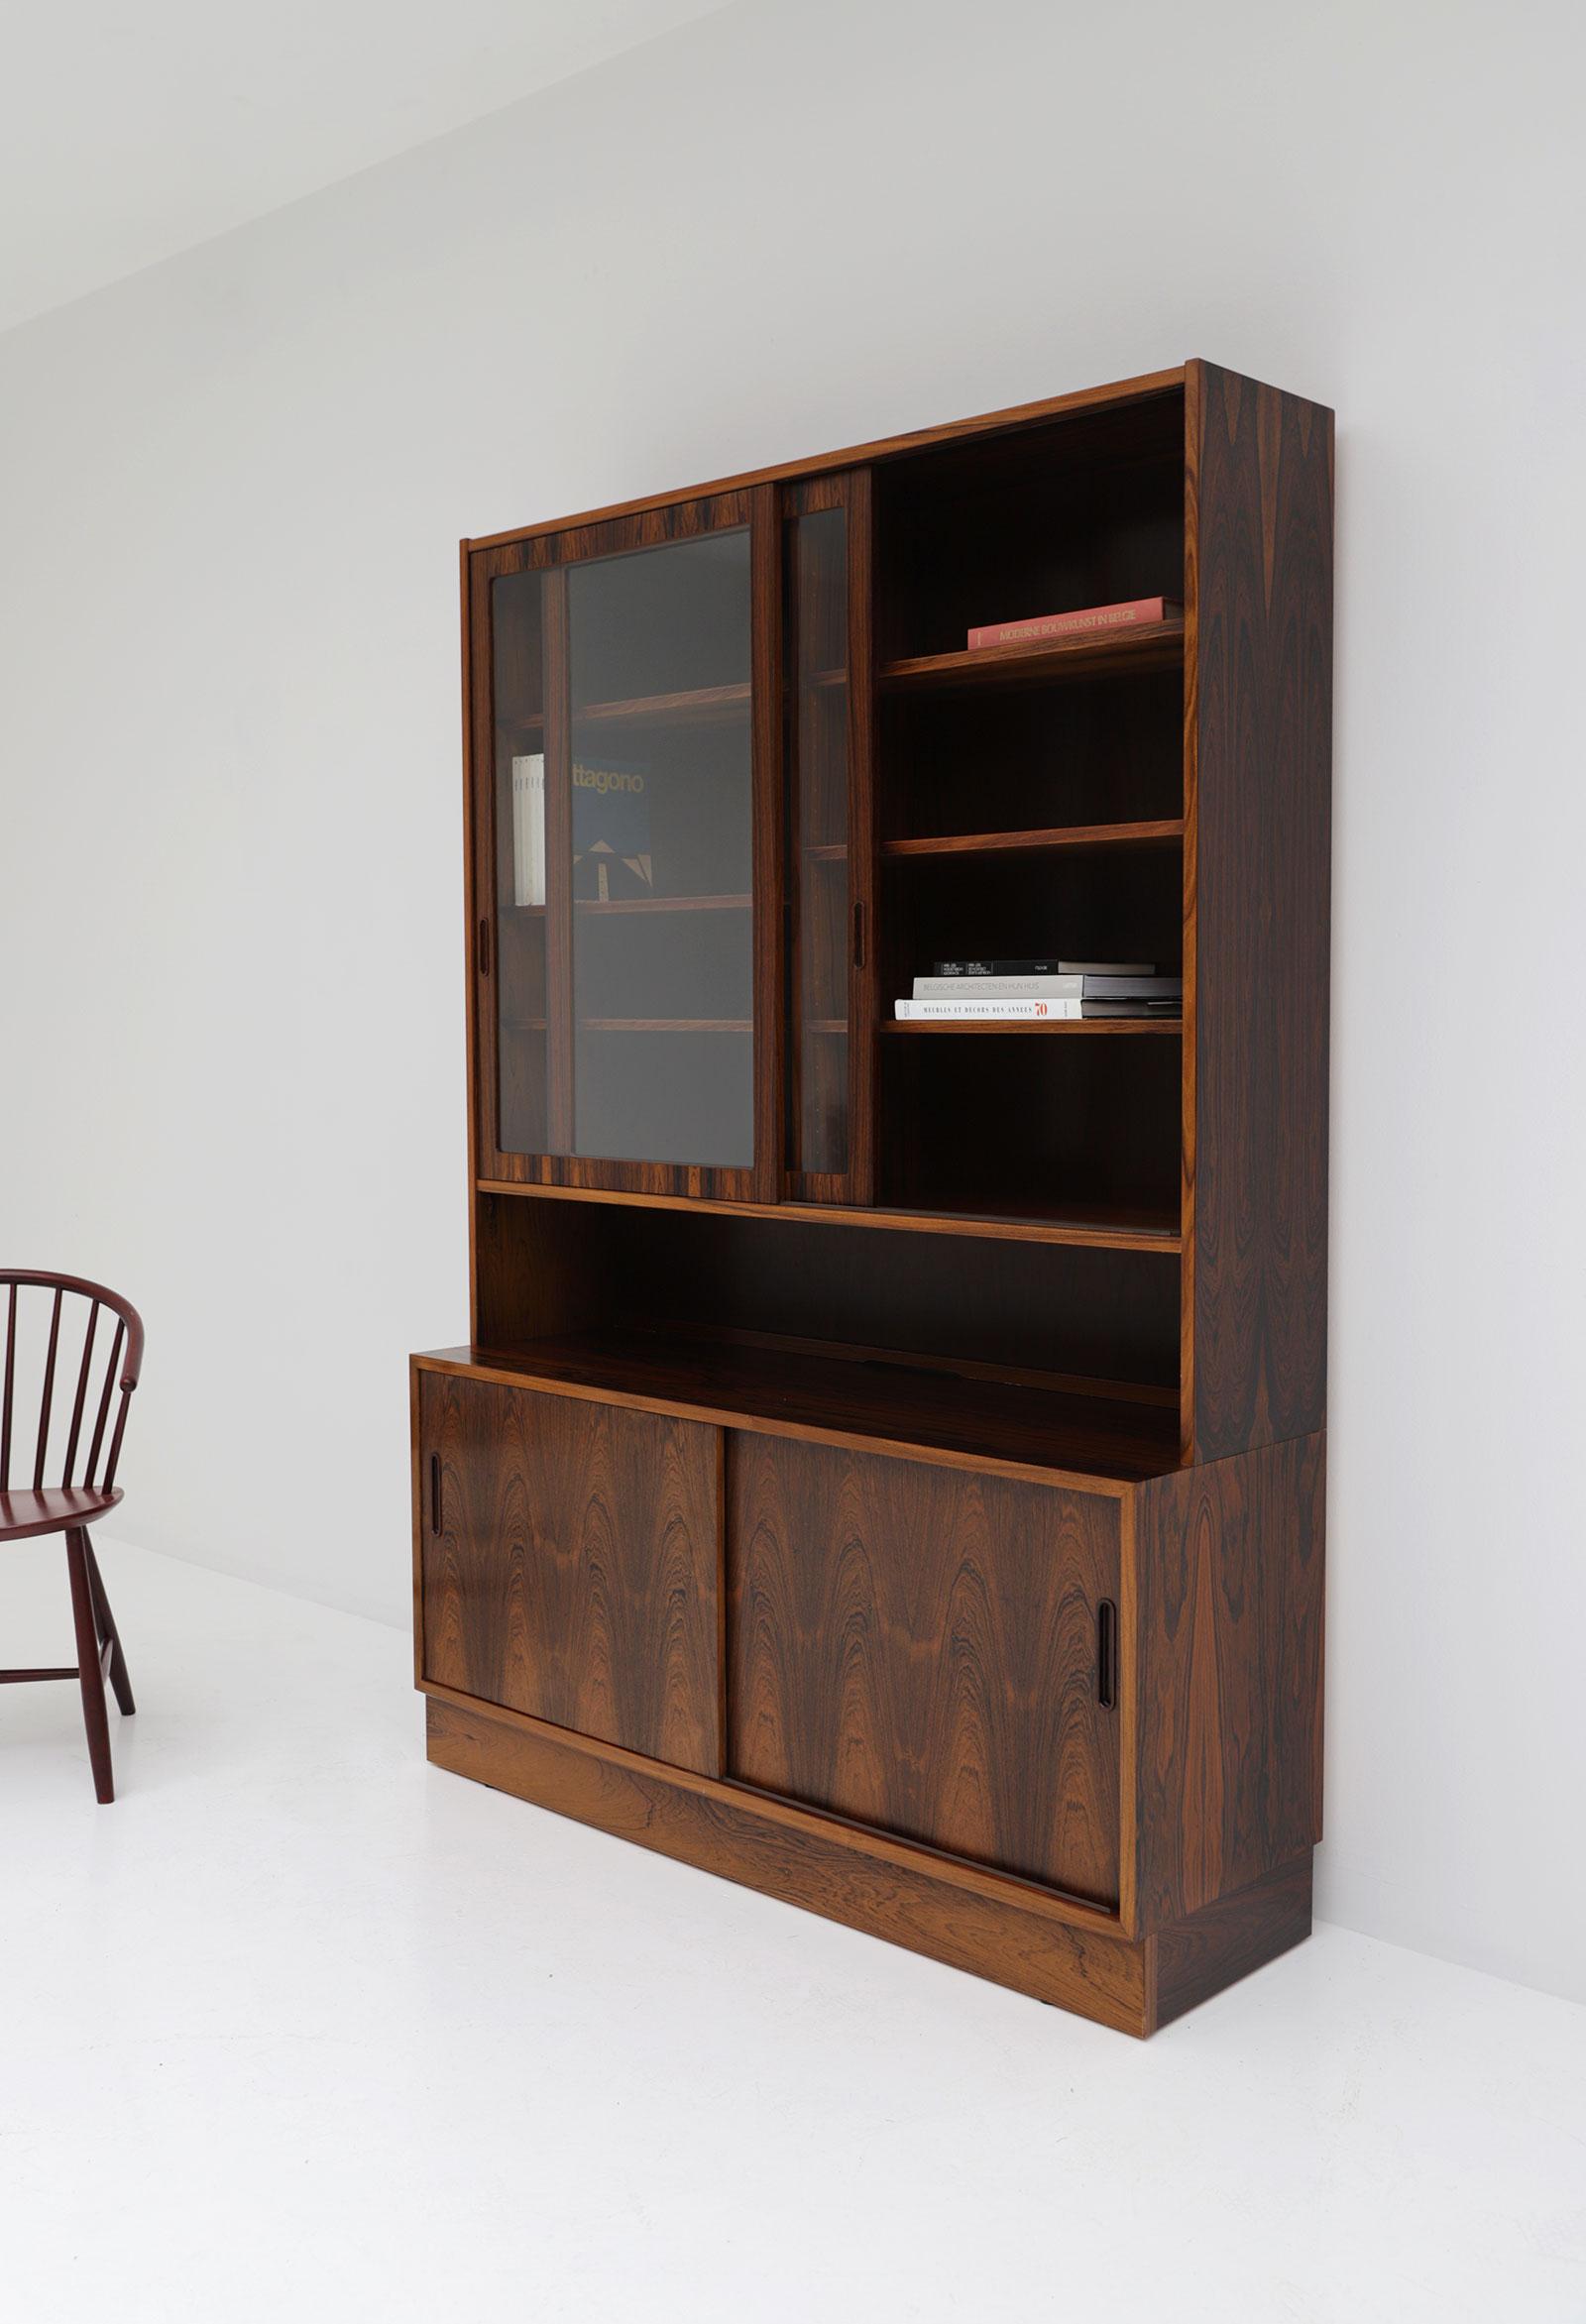 cabinet by Erik Brouer for Mobelfabrik 1960image 12